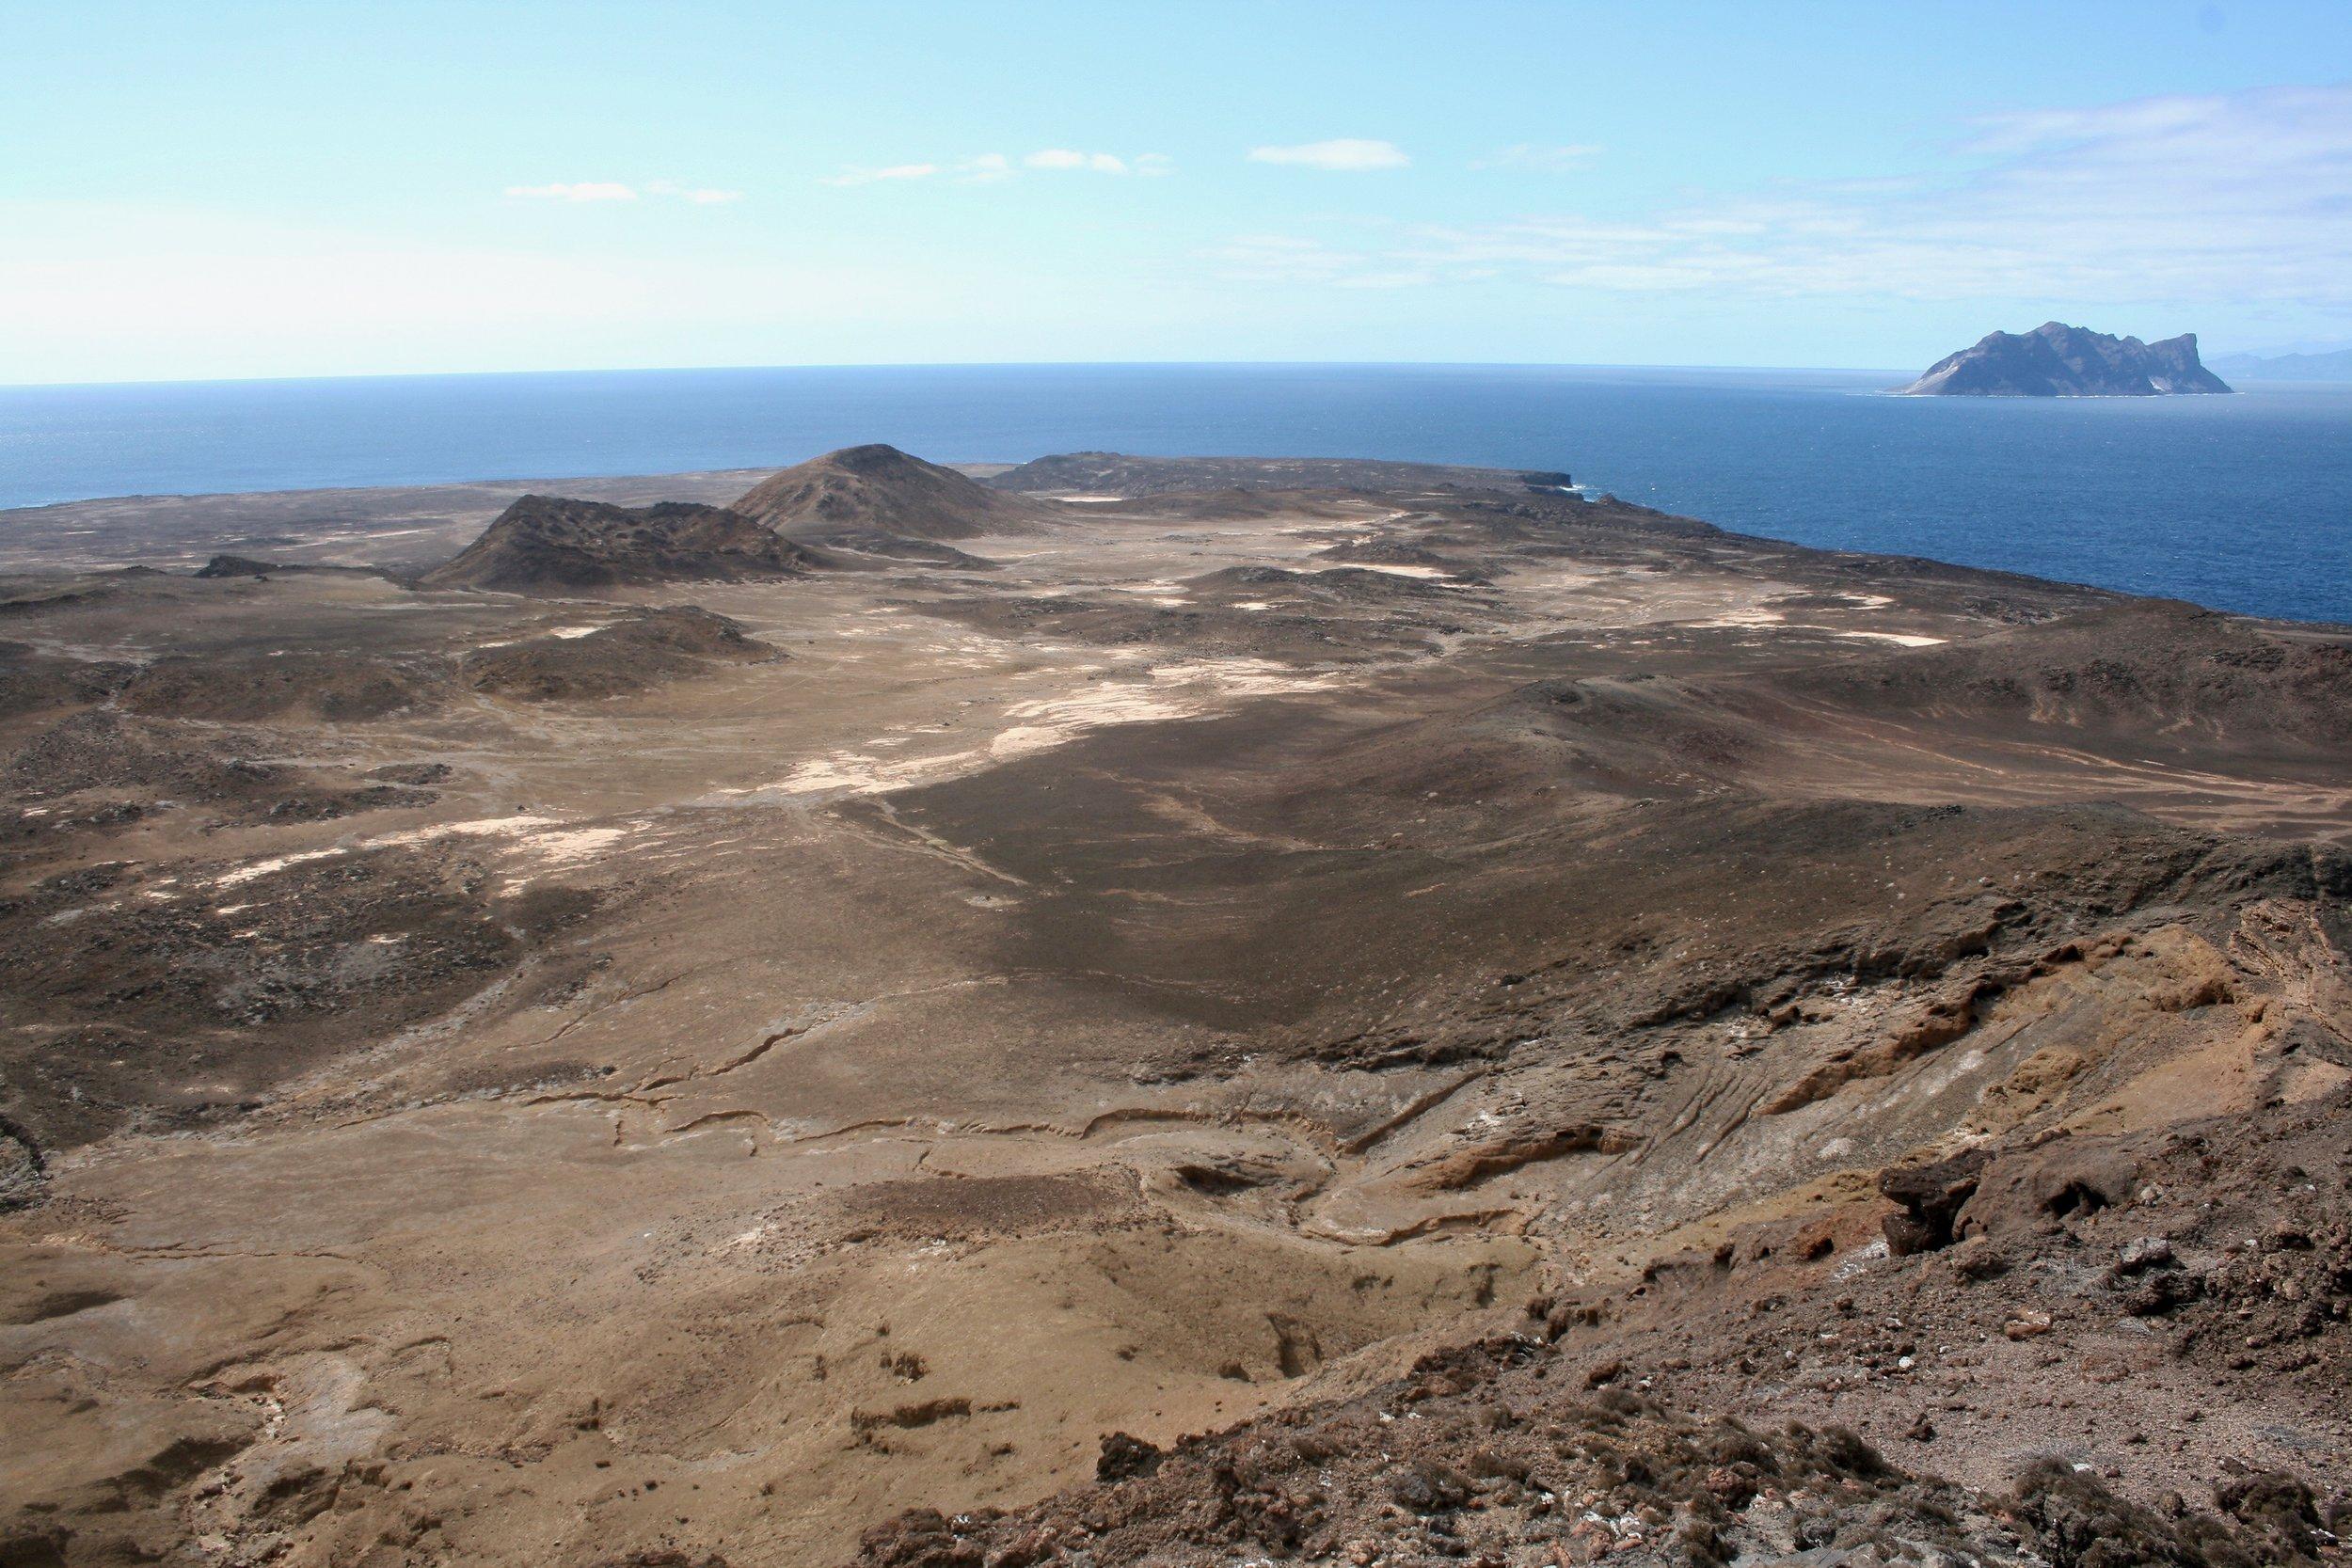 Ilhéu Raso, Cape Verde Islands